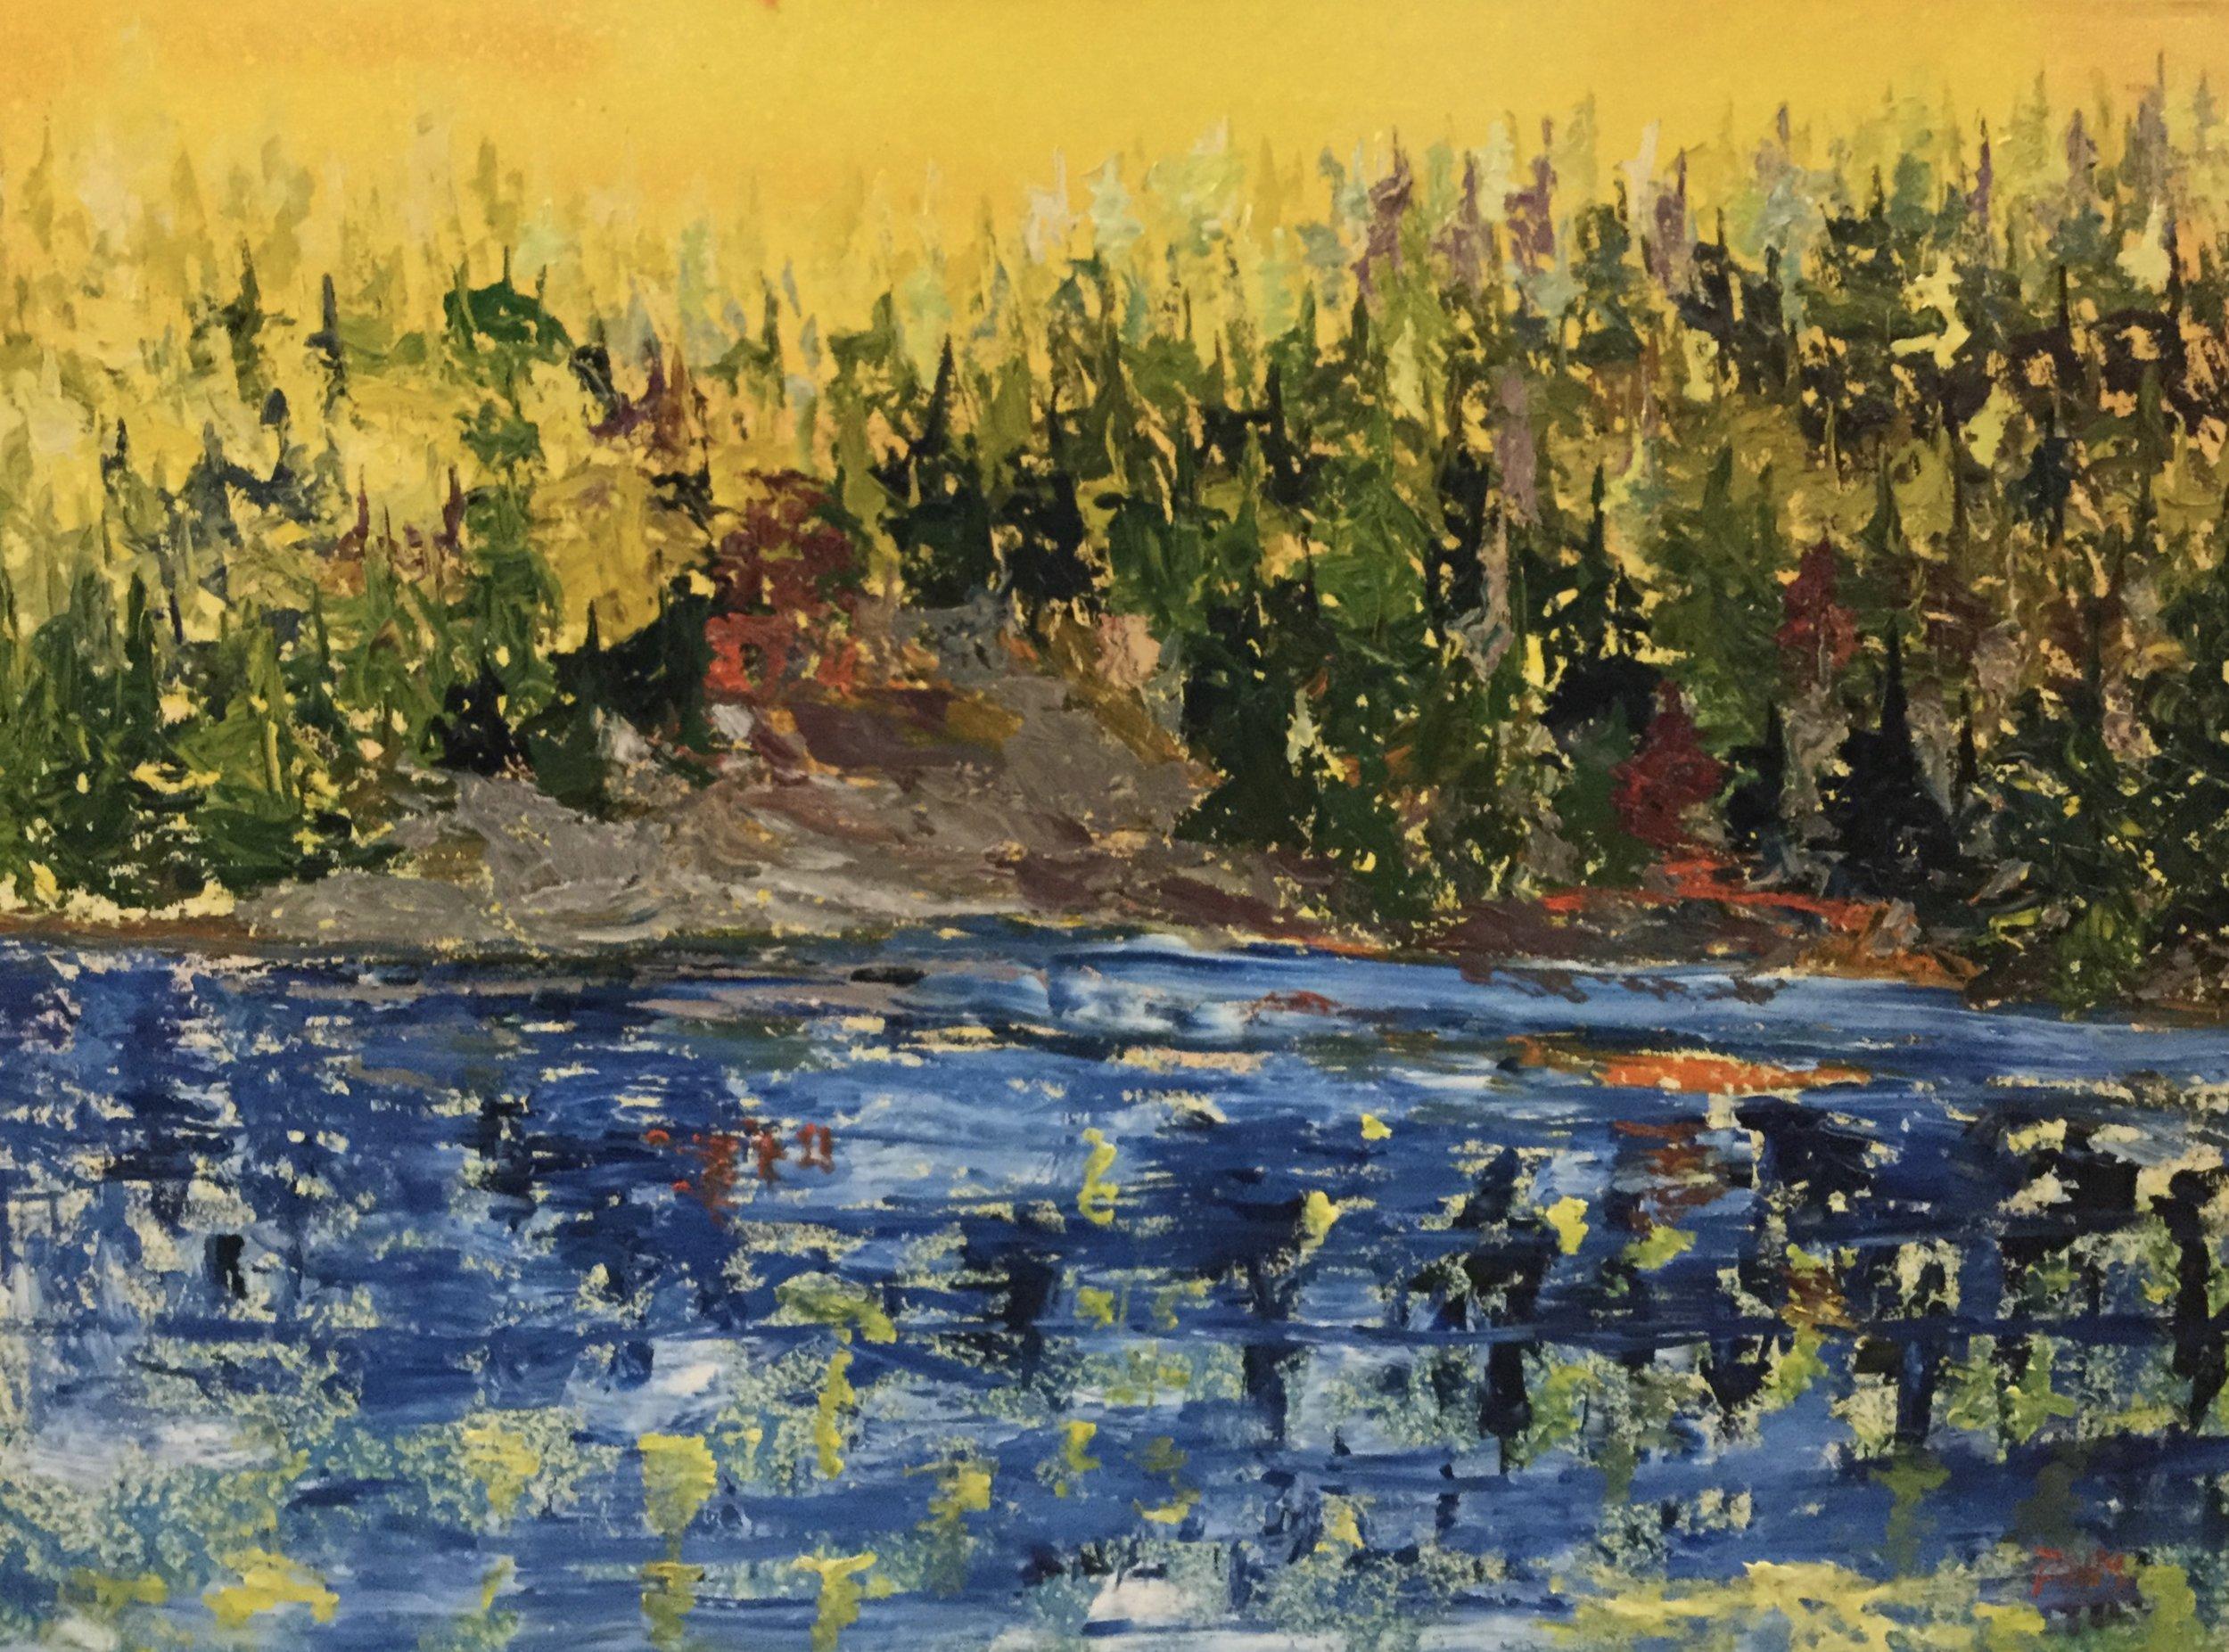 yellow Harmony, 36X48, Oil on Canvas